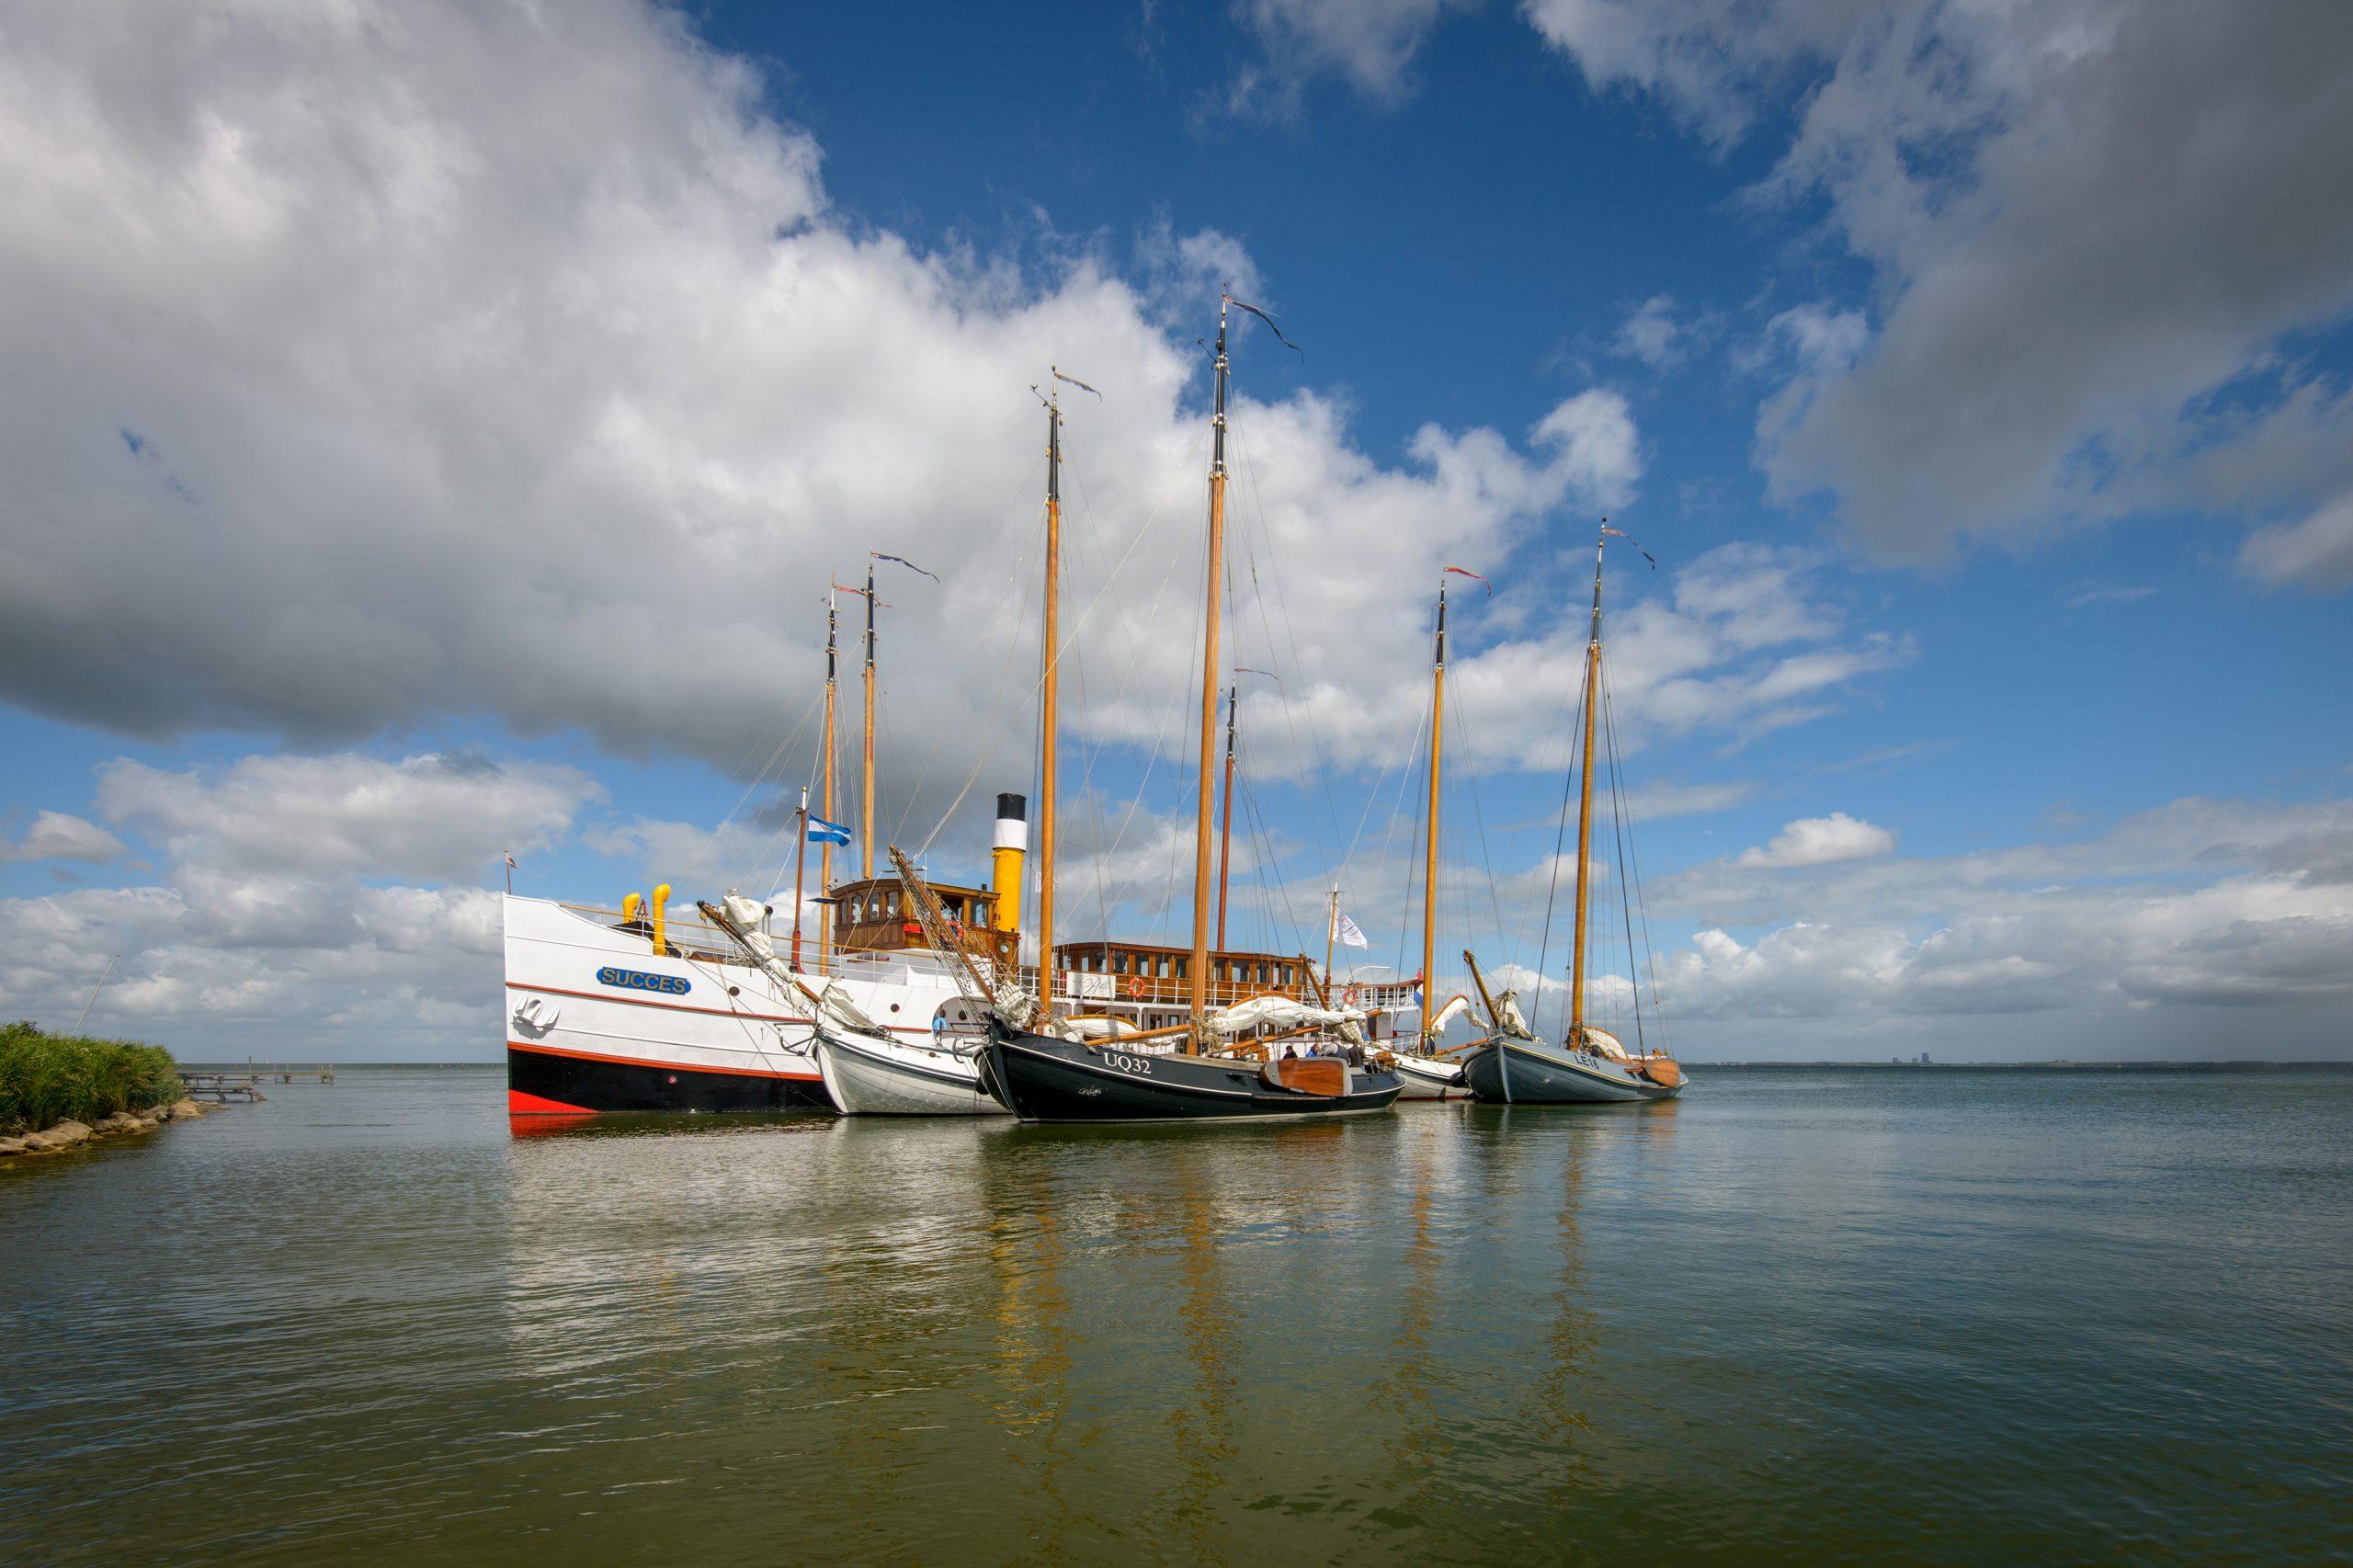 regatta